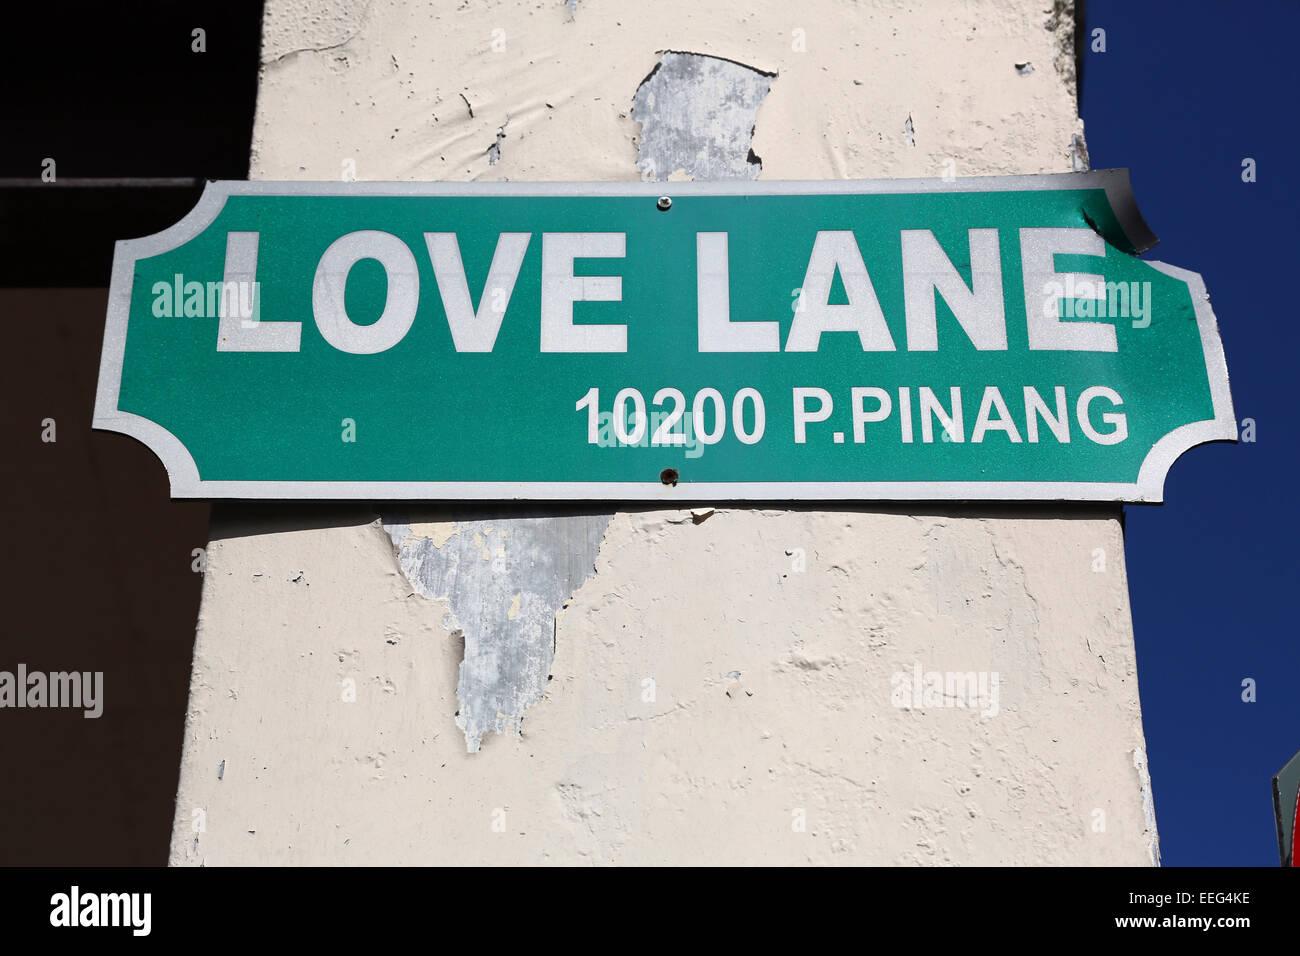 Love Lane Street Sign, Georgetown, Penang, Malaysia - Stock Image